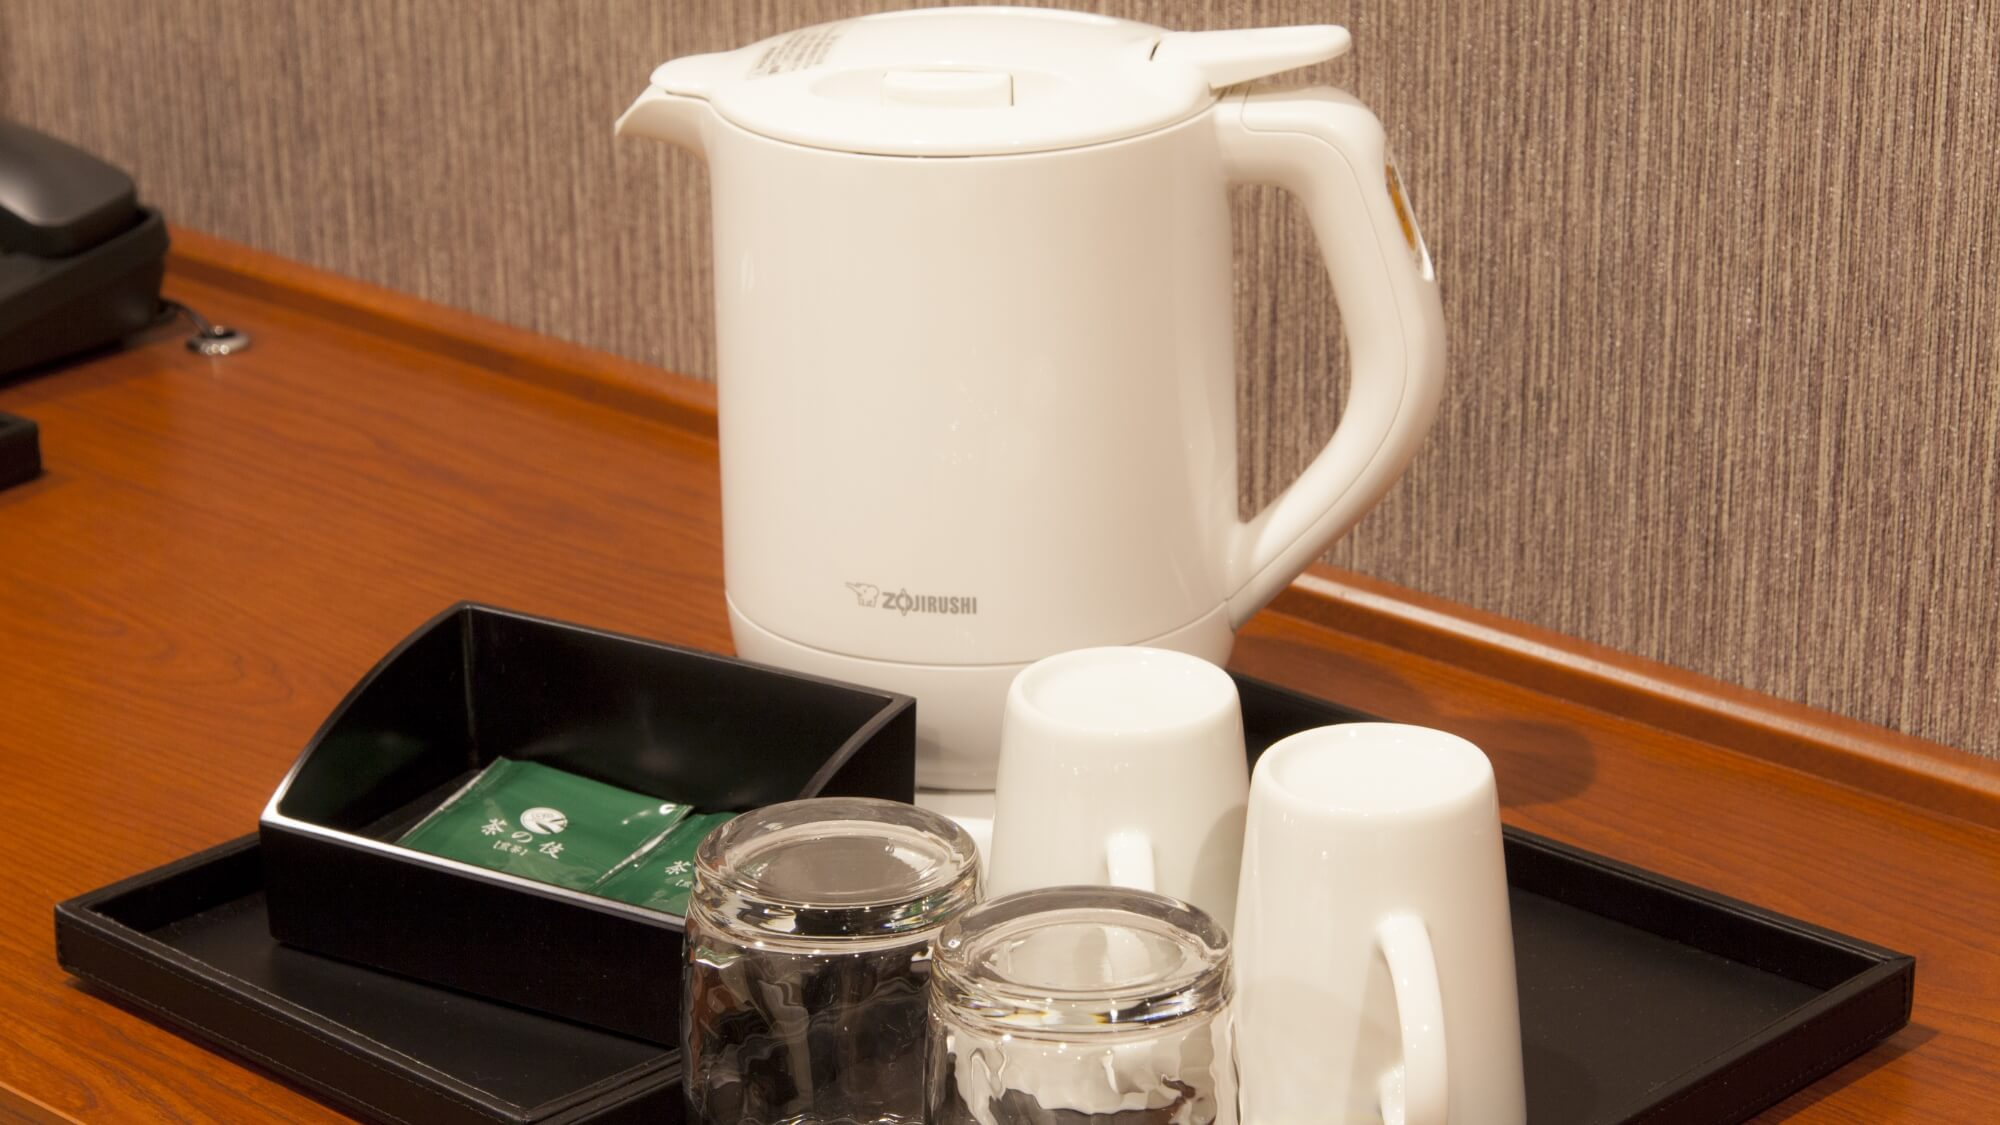 【MAIN TOWER】電気ケトル・マグカップ(有田焼き)・グラス